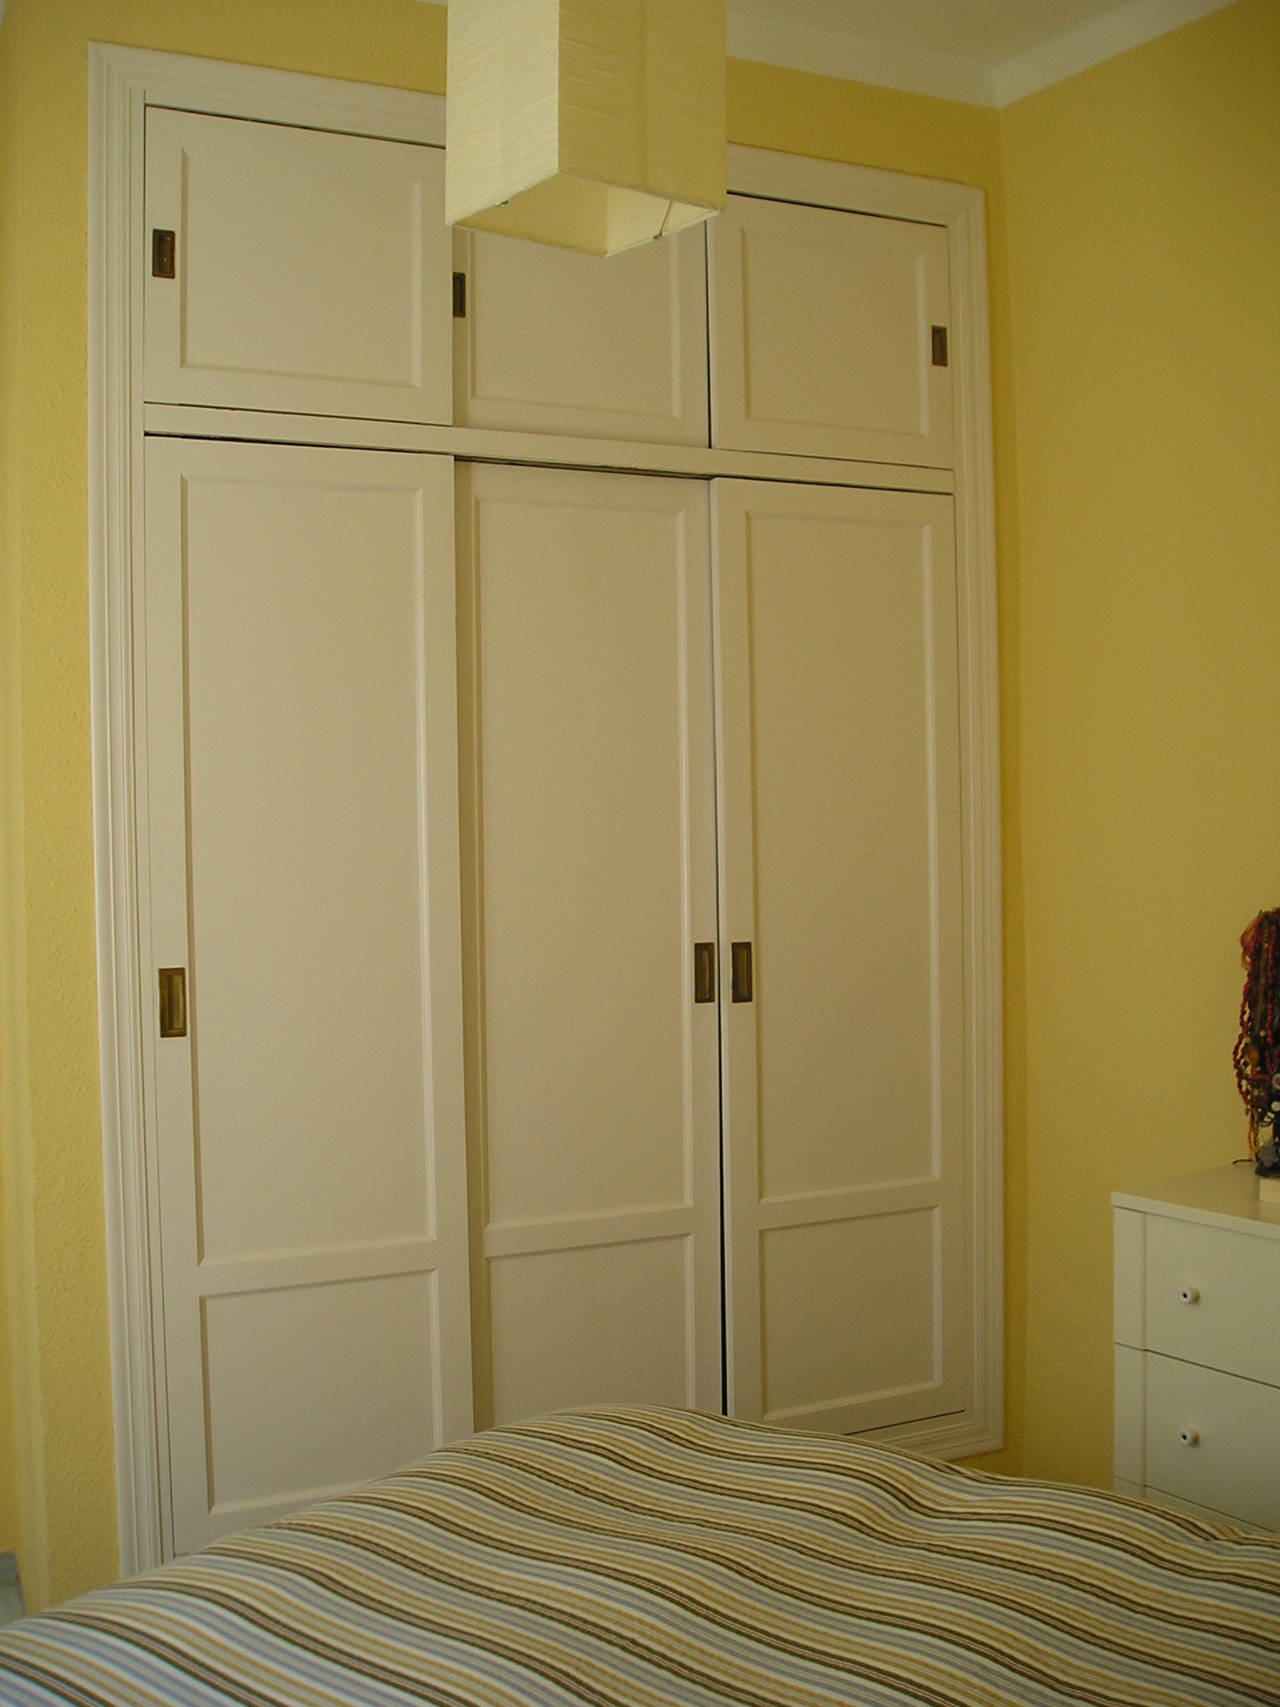 alquiler apartamento. Calle San Juan de Dios 17, 3º d. Sevilla  - Foto 2